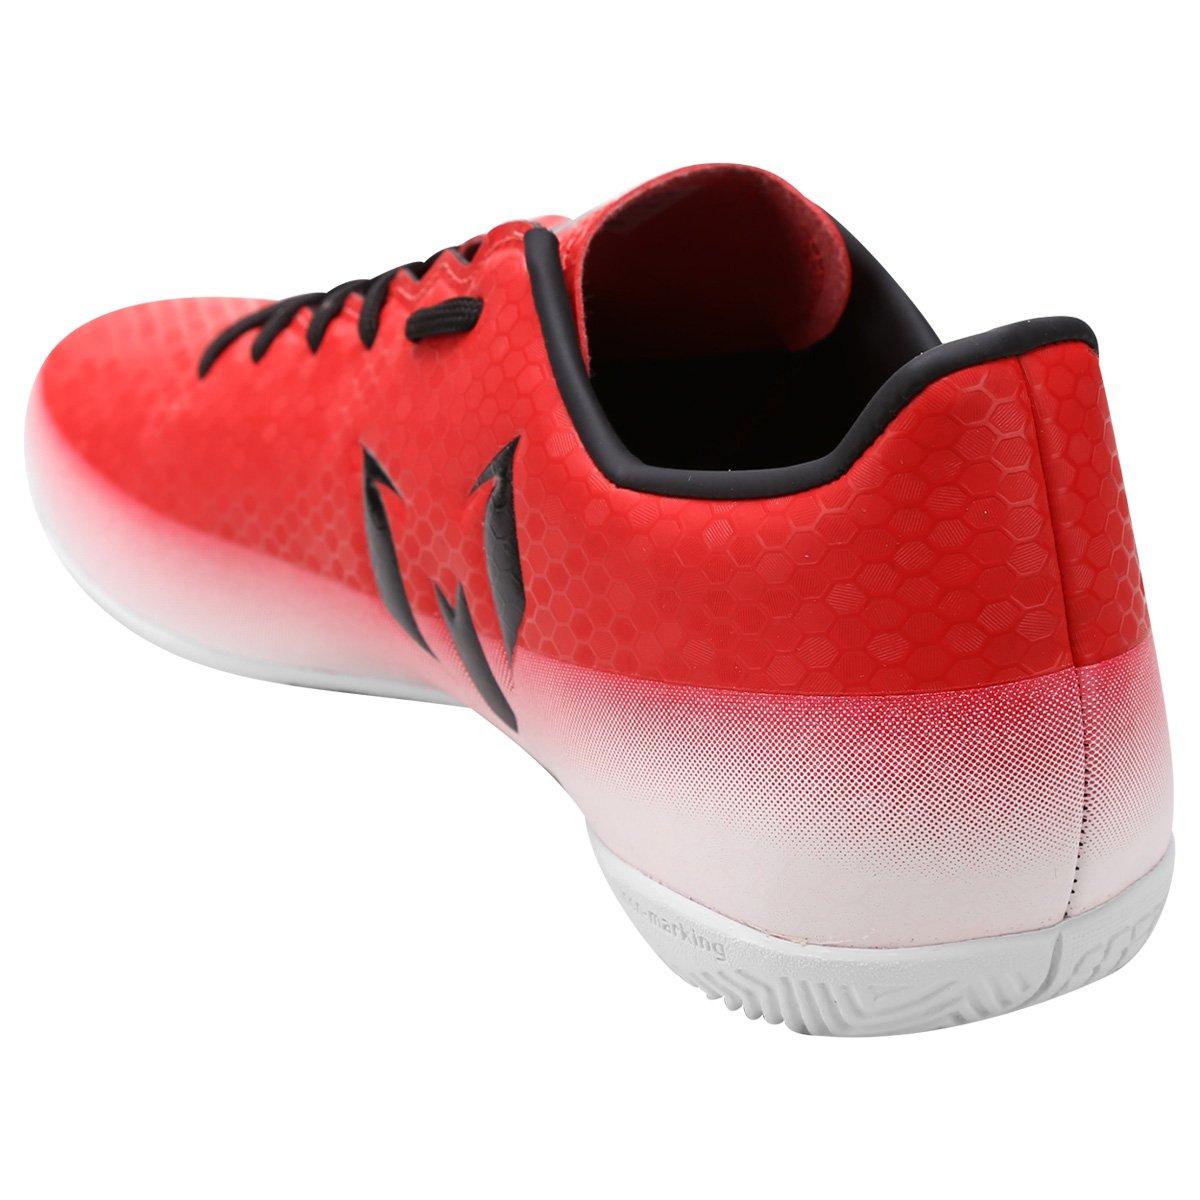 Chuteira Futsal Adidas Messi 16.4 IN Masculina - Vermelho e Branco ... 6414f57ceea4d